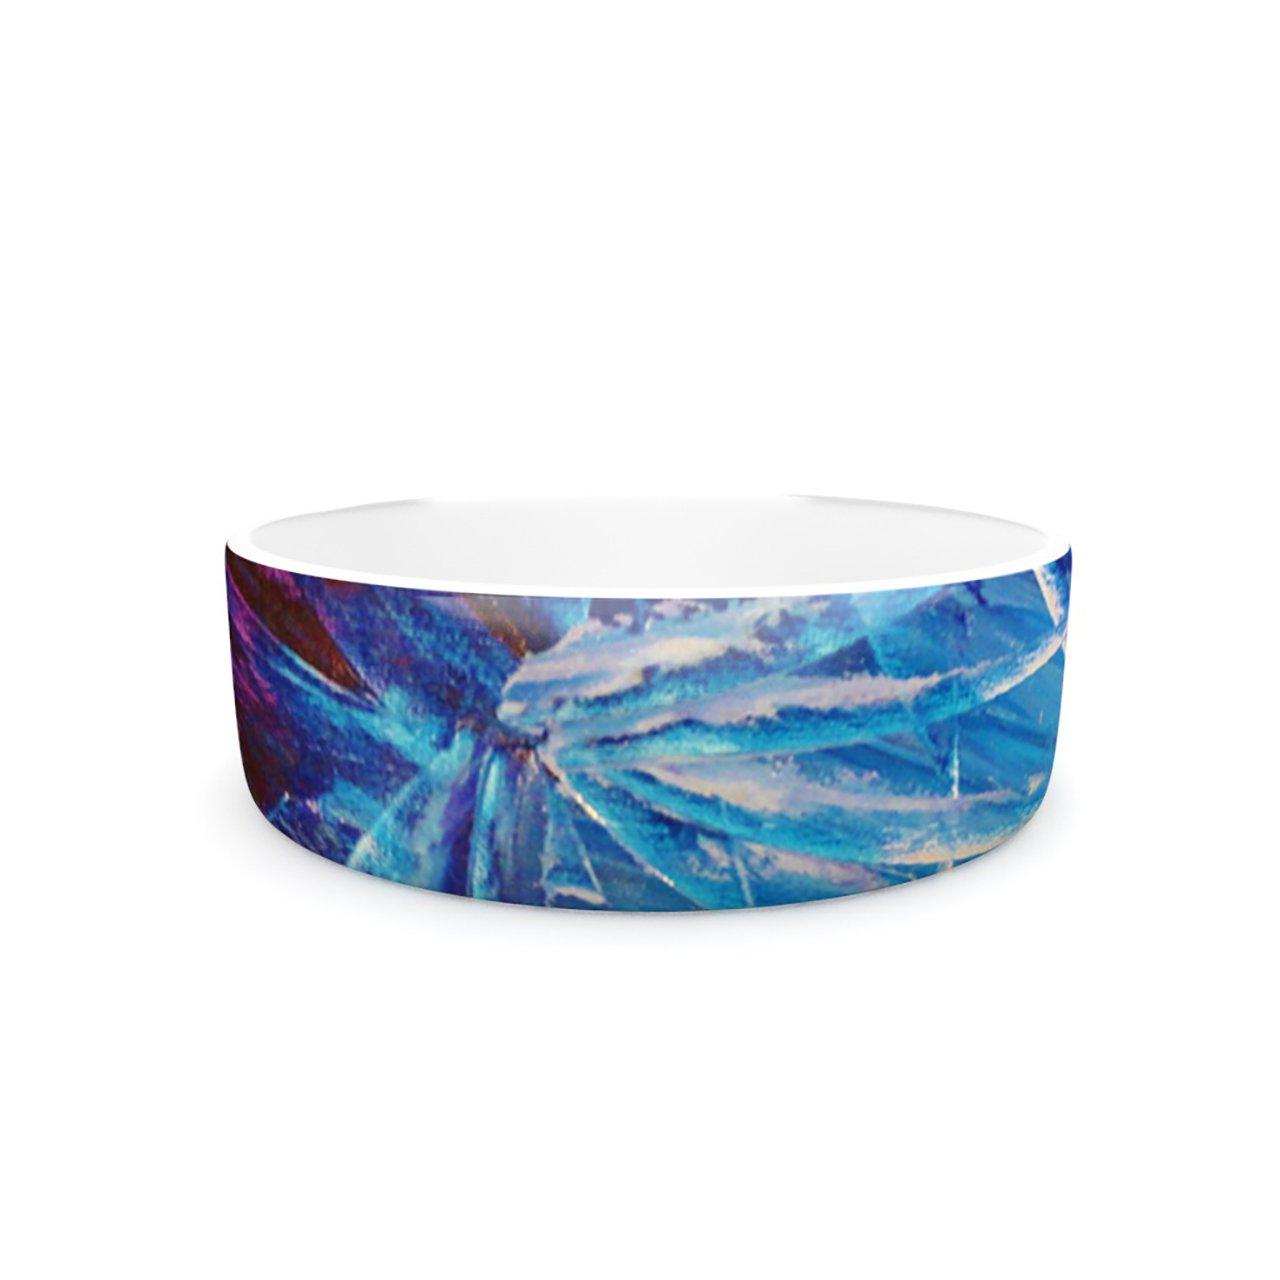 Kess InHouse Ebi Emporium Night Flowers  Pet Bowl, 7-Inch, bluee White